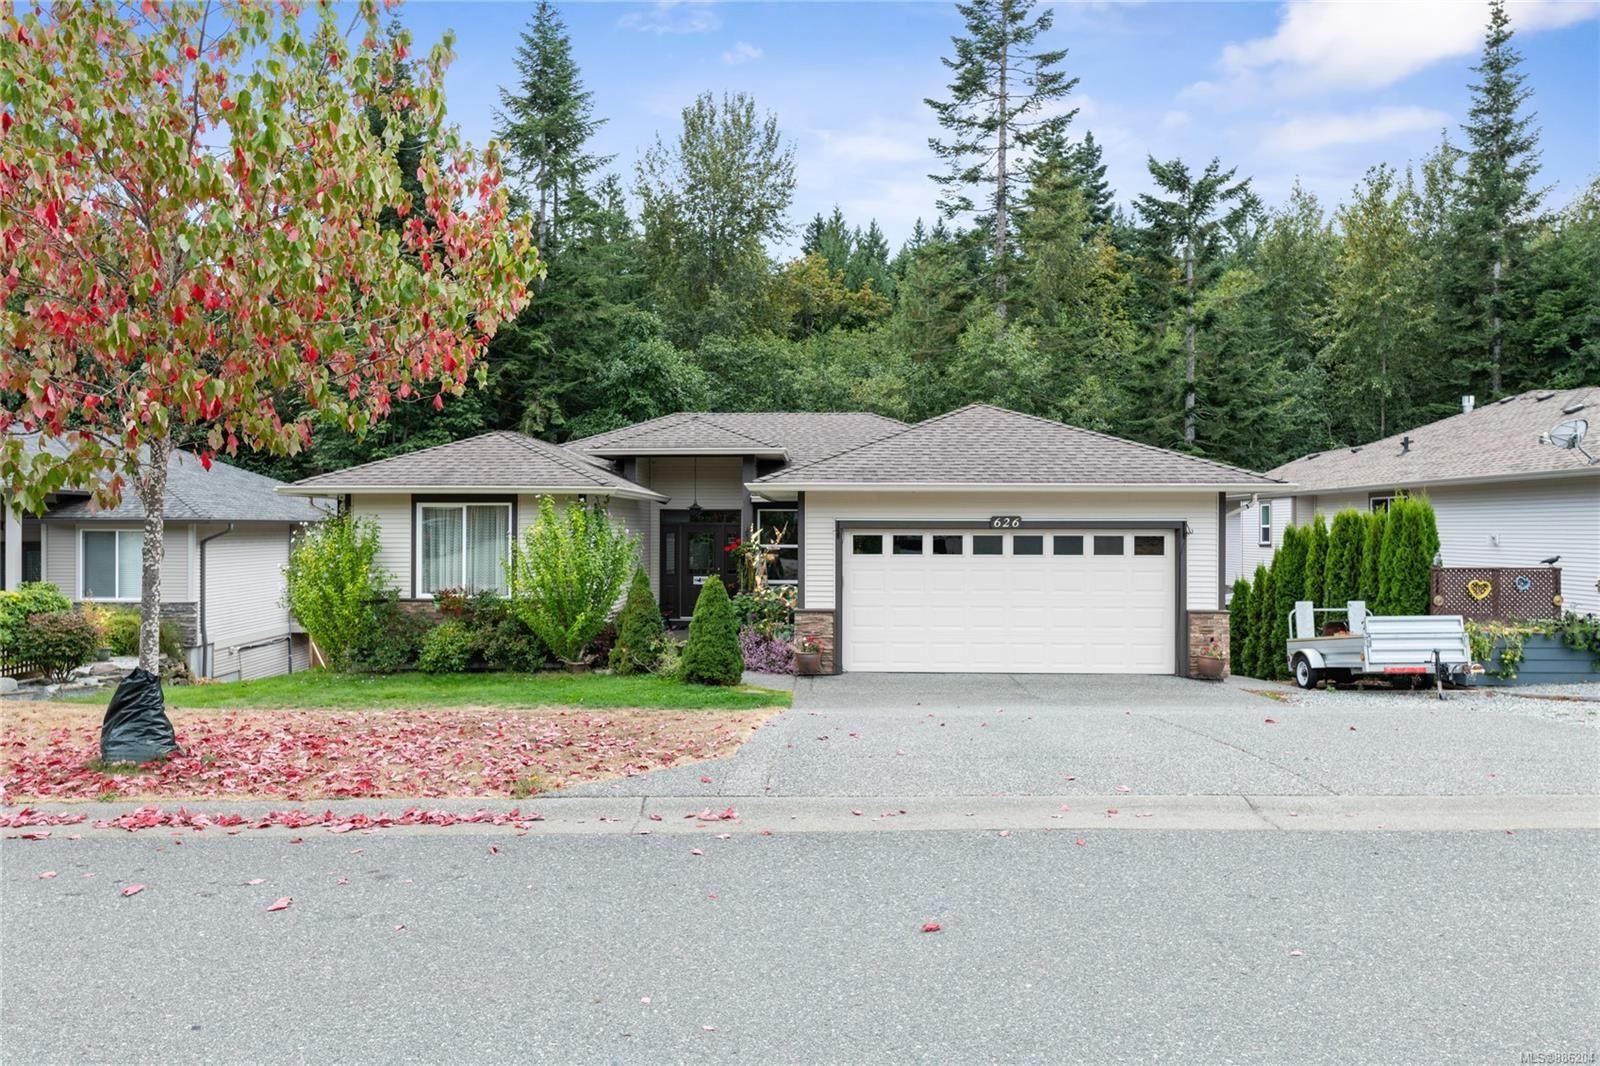 Main Photo: 626 Sanderson Rd in : Du Ladysmith House for sale (Duncan)  : MLS®# 886204